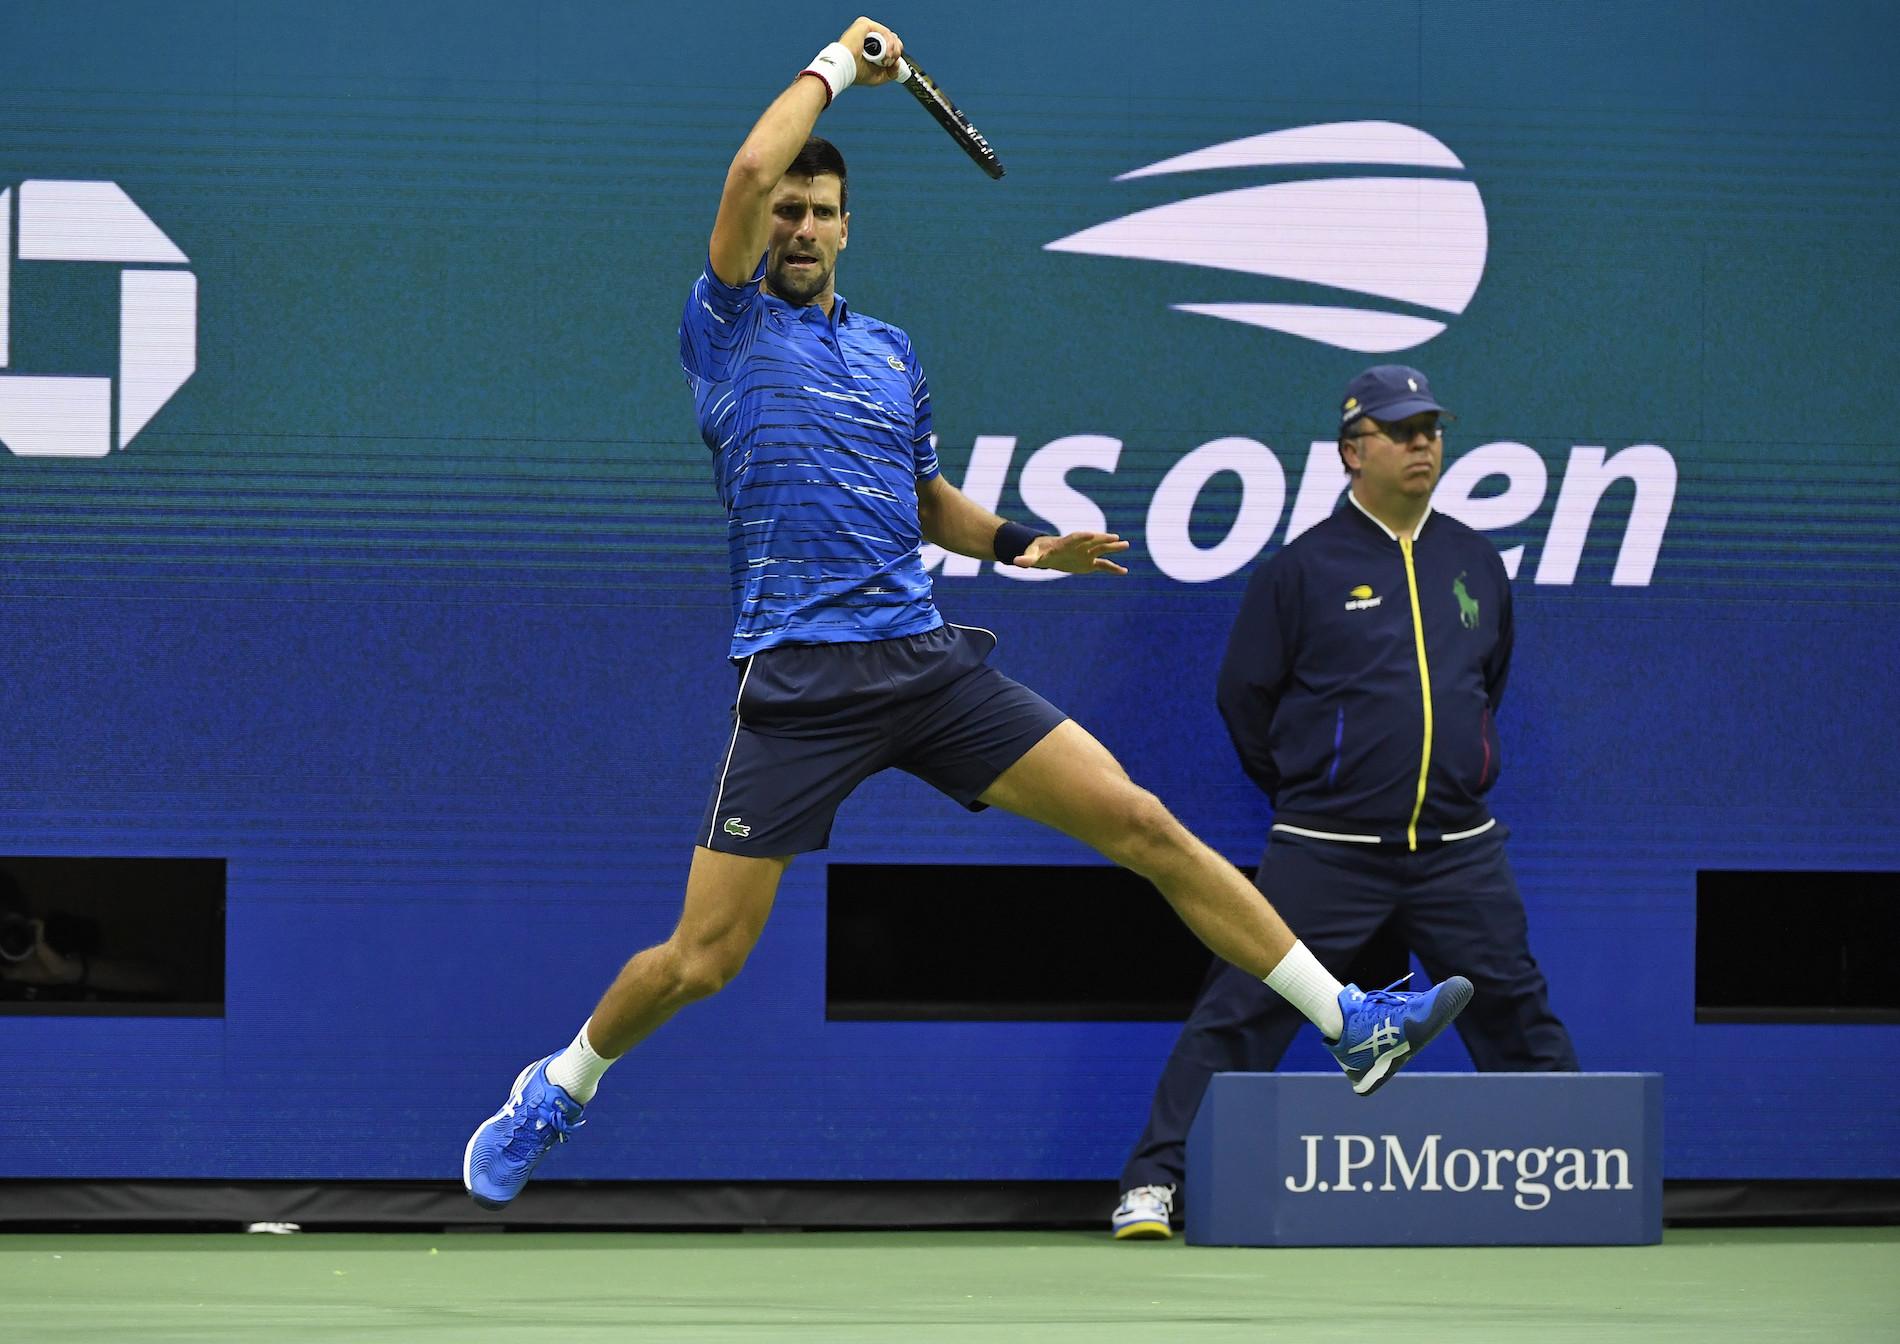 US Open - Novak Djokovic